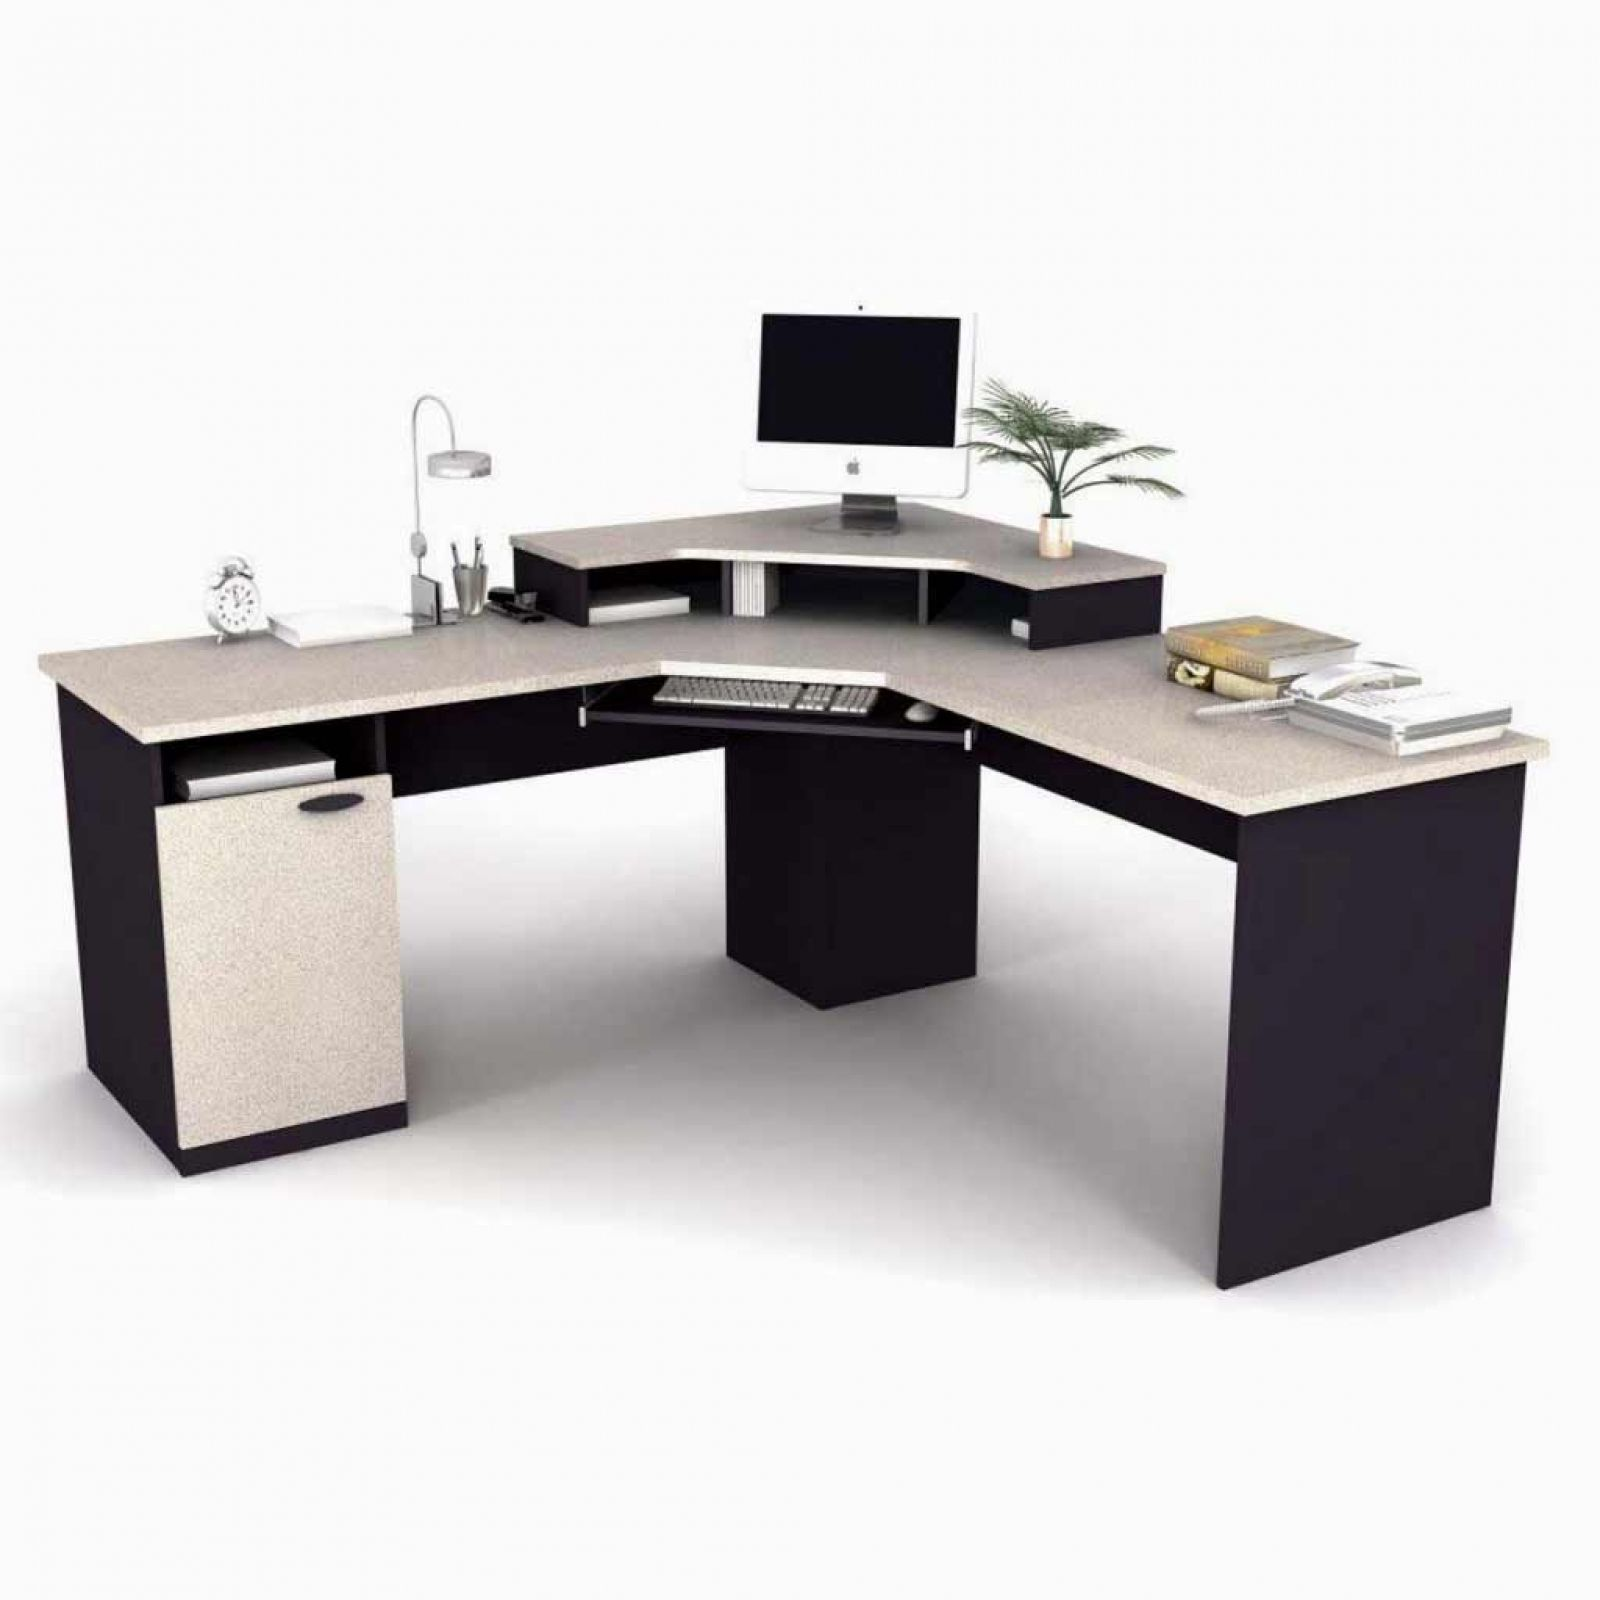 27+ DIY Computer Desk Ideas & Tutorials for Home Office tags: computer desk  ideas